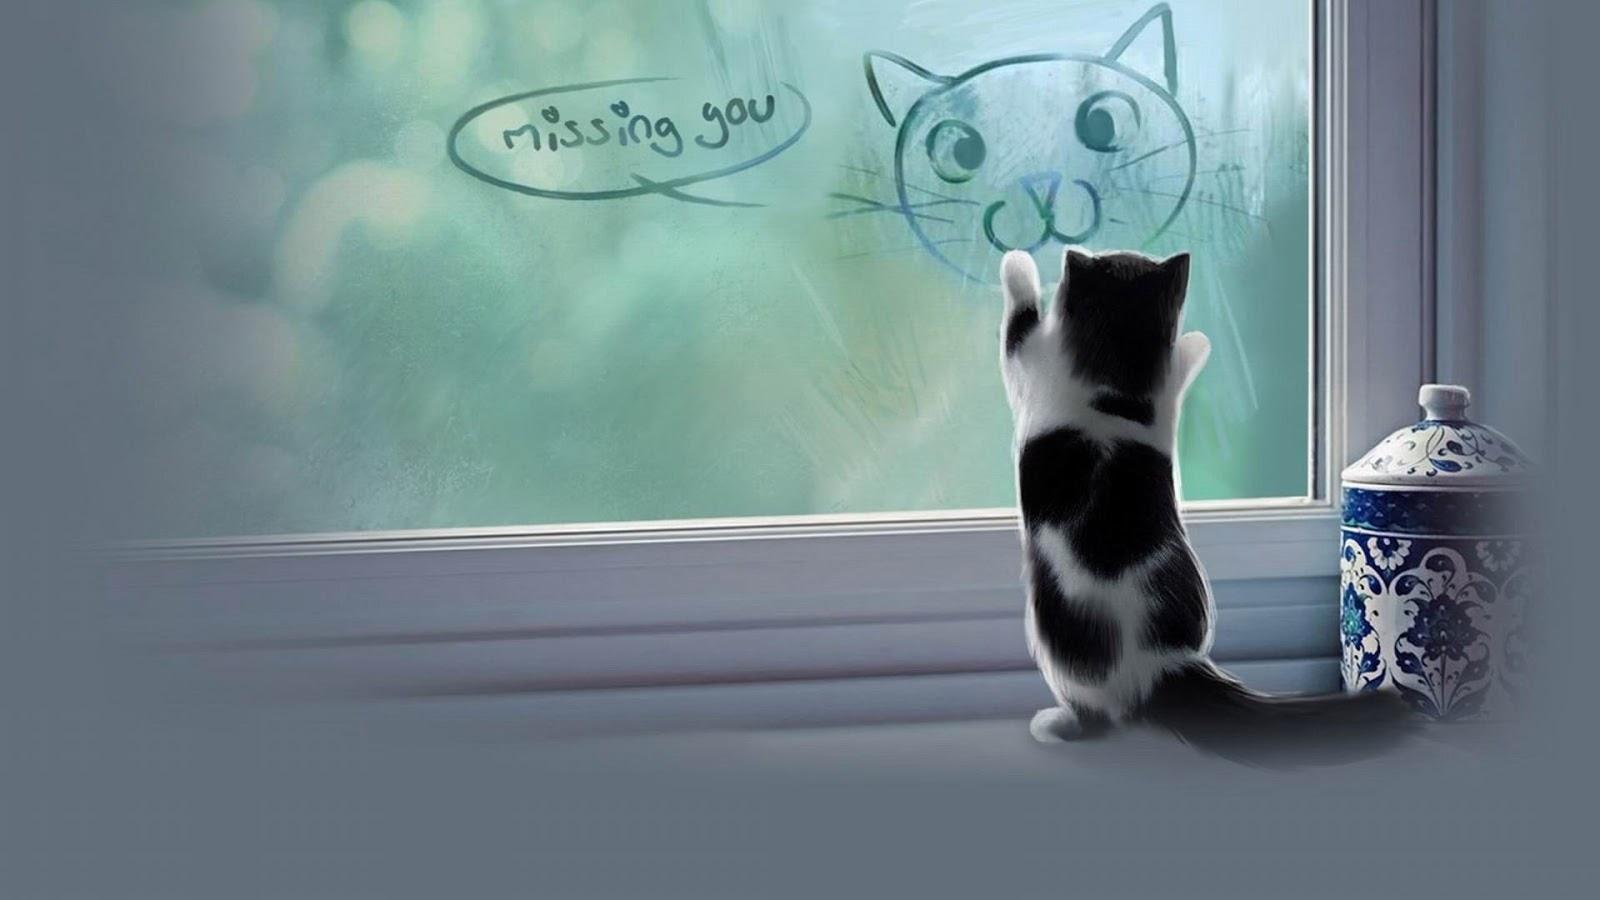 [I Miss You] Sad Image | Sad Quotes | Love Quotes | [HNQuotes]